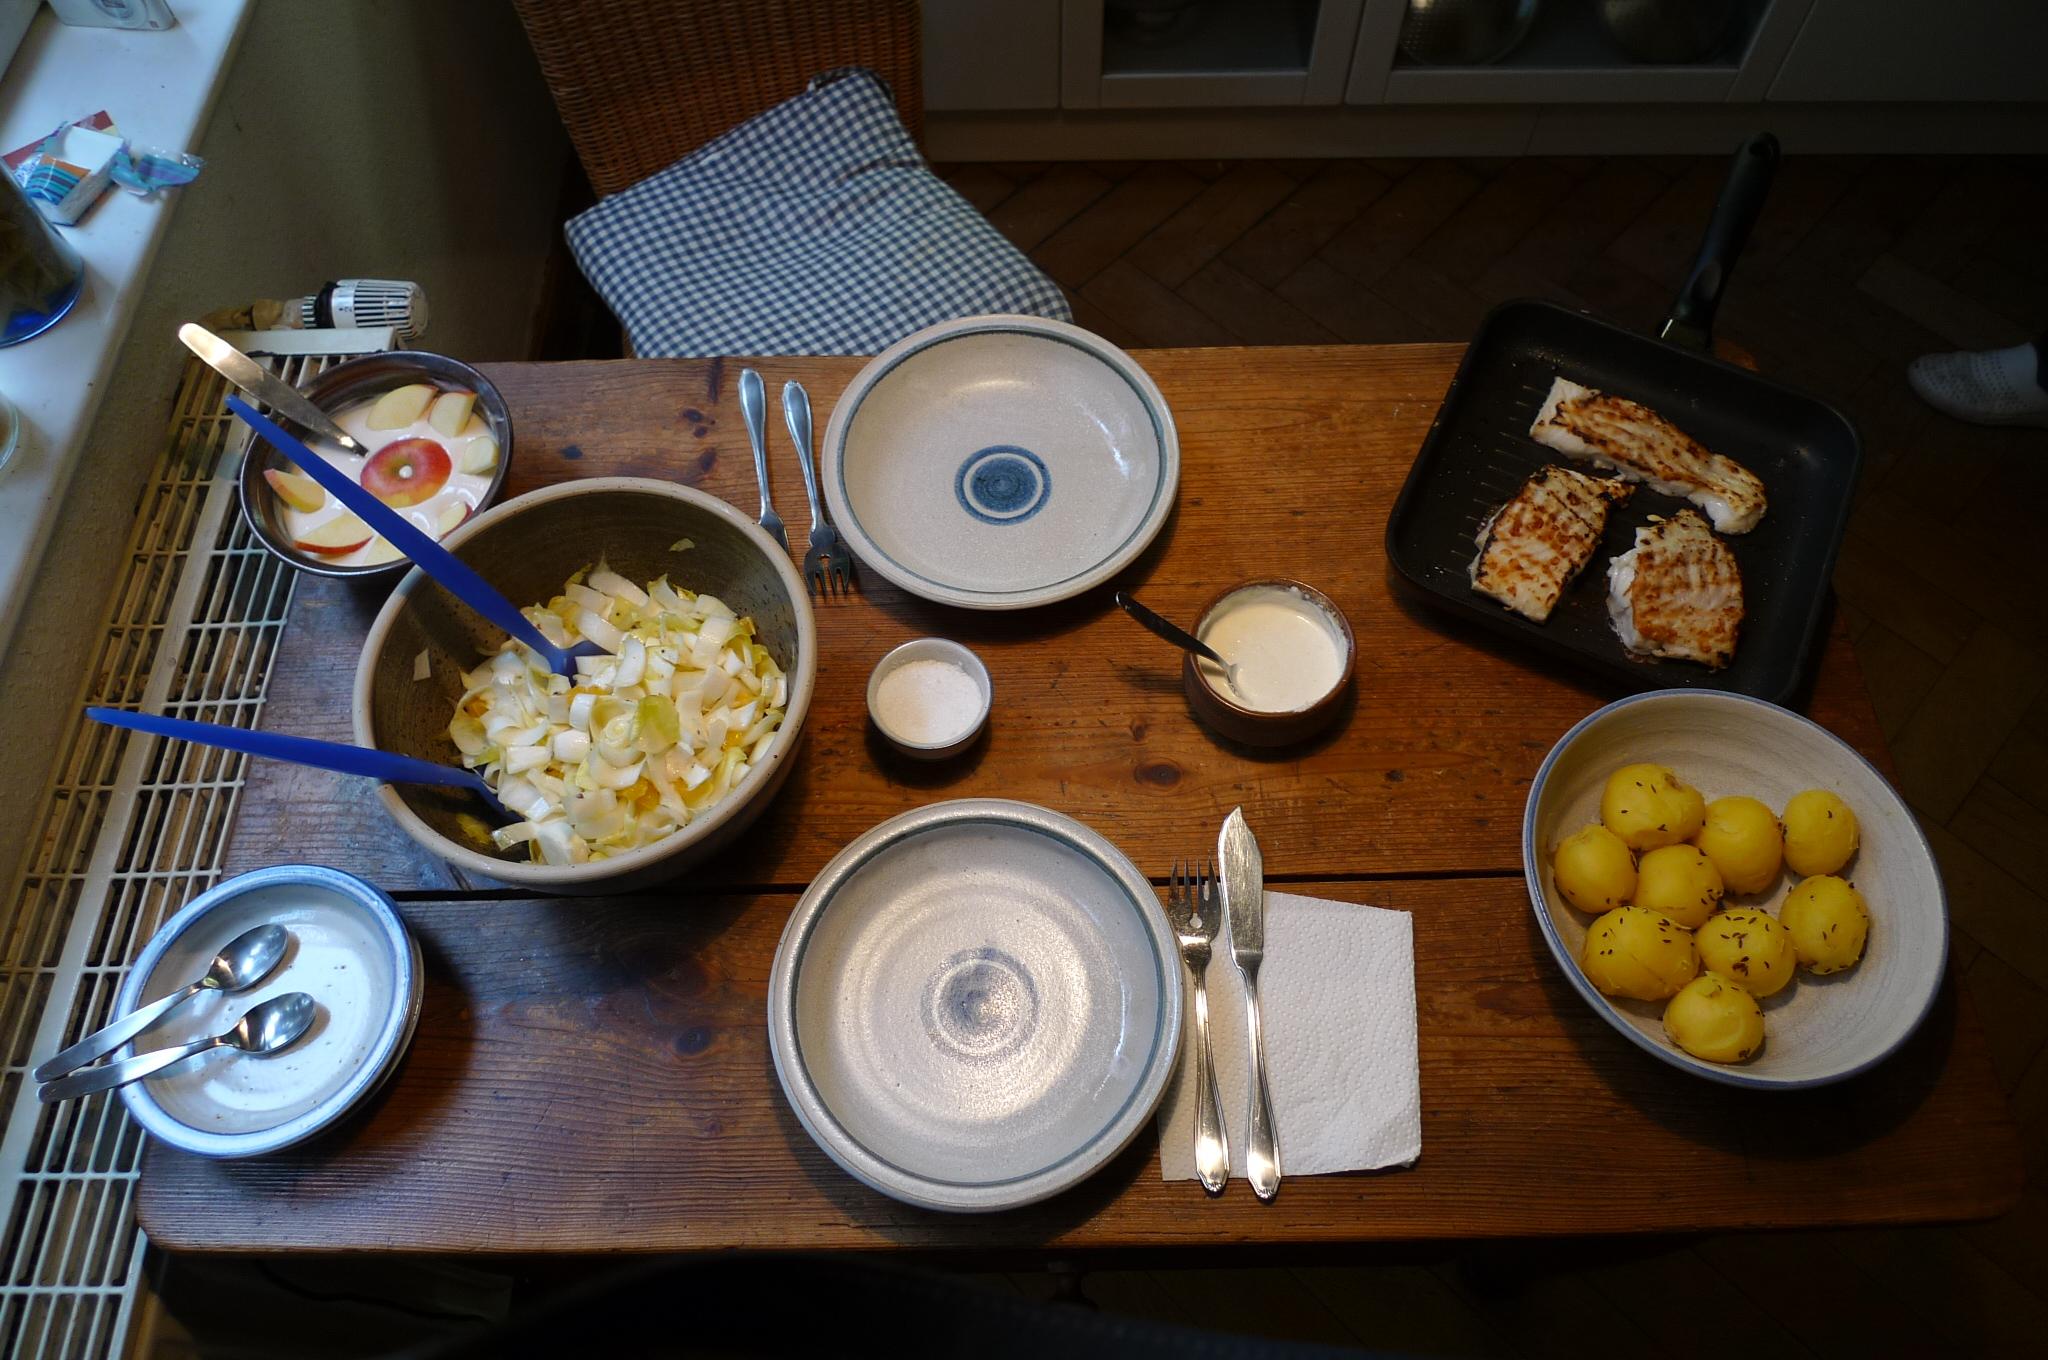 Kabeljau,Chicoreesalat,Kartoffeln,Quarkspeise - 17.2.15   (10)